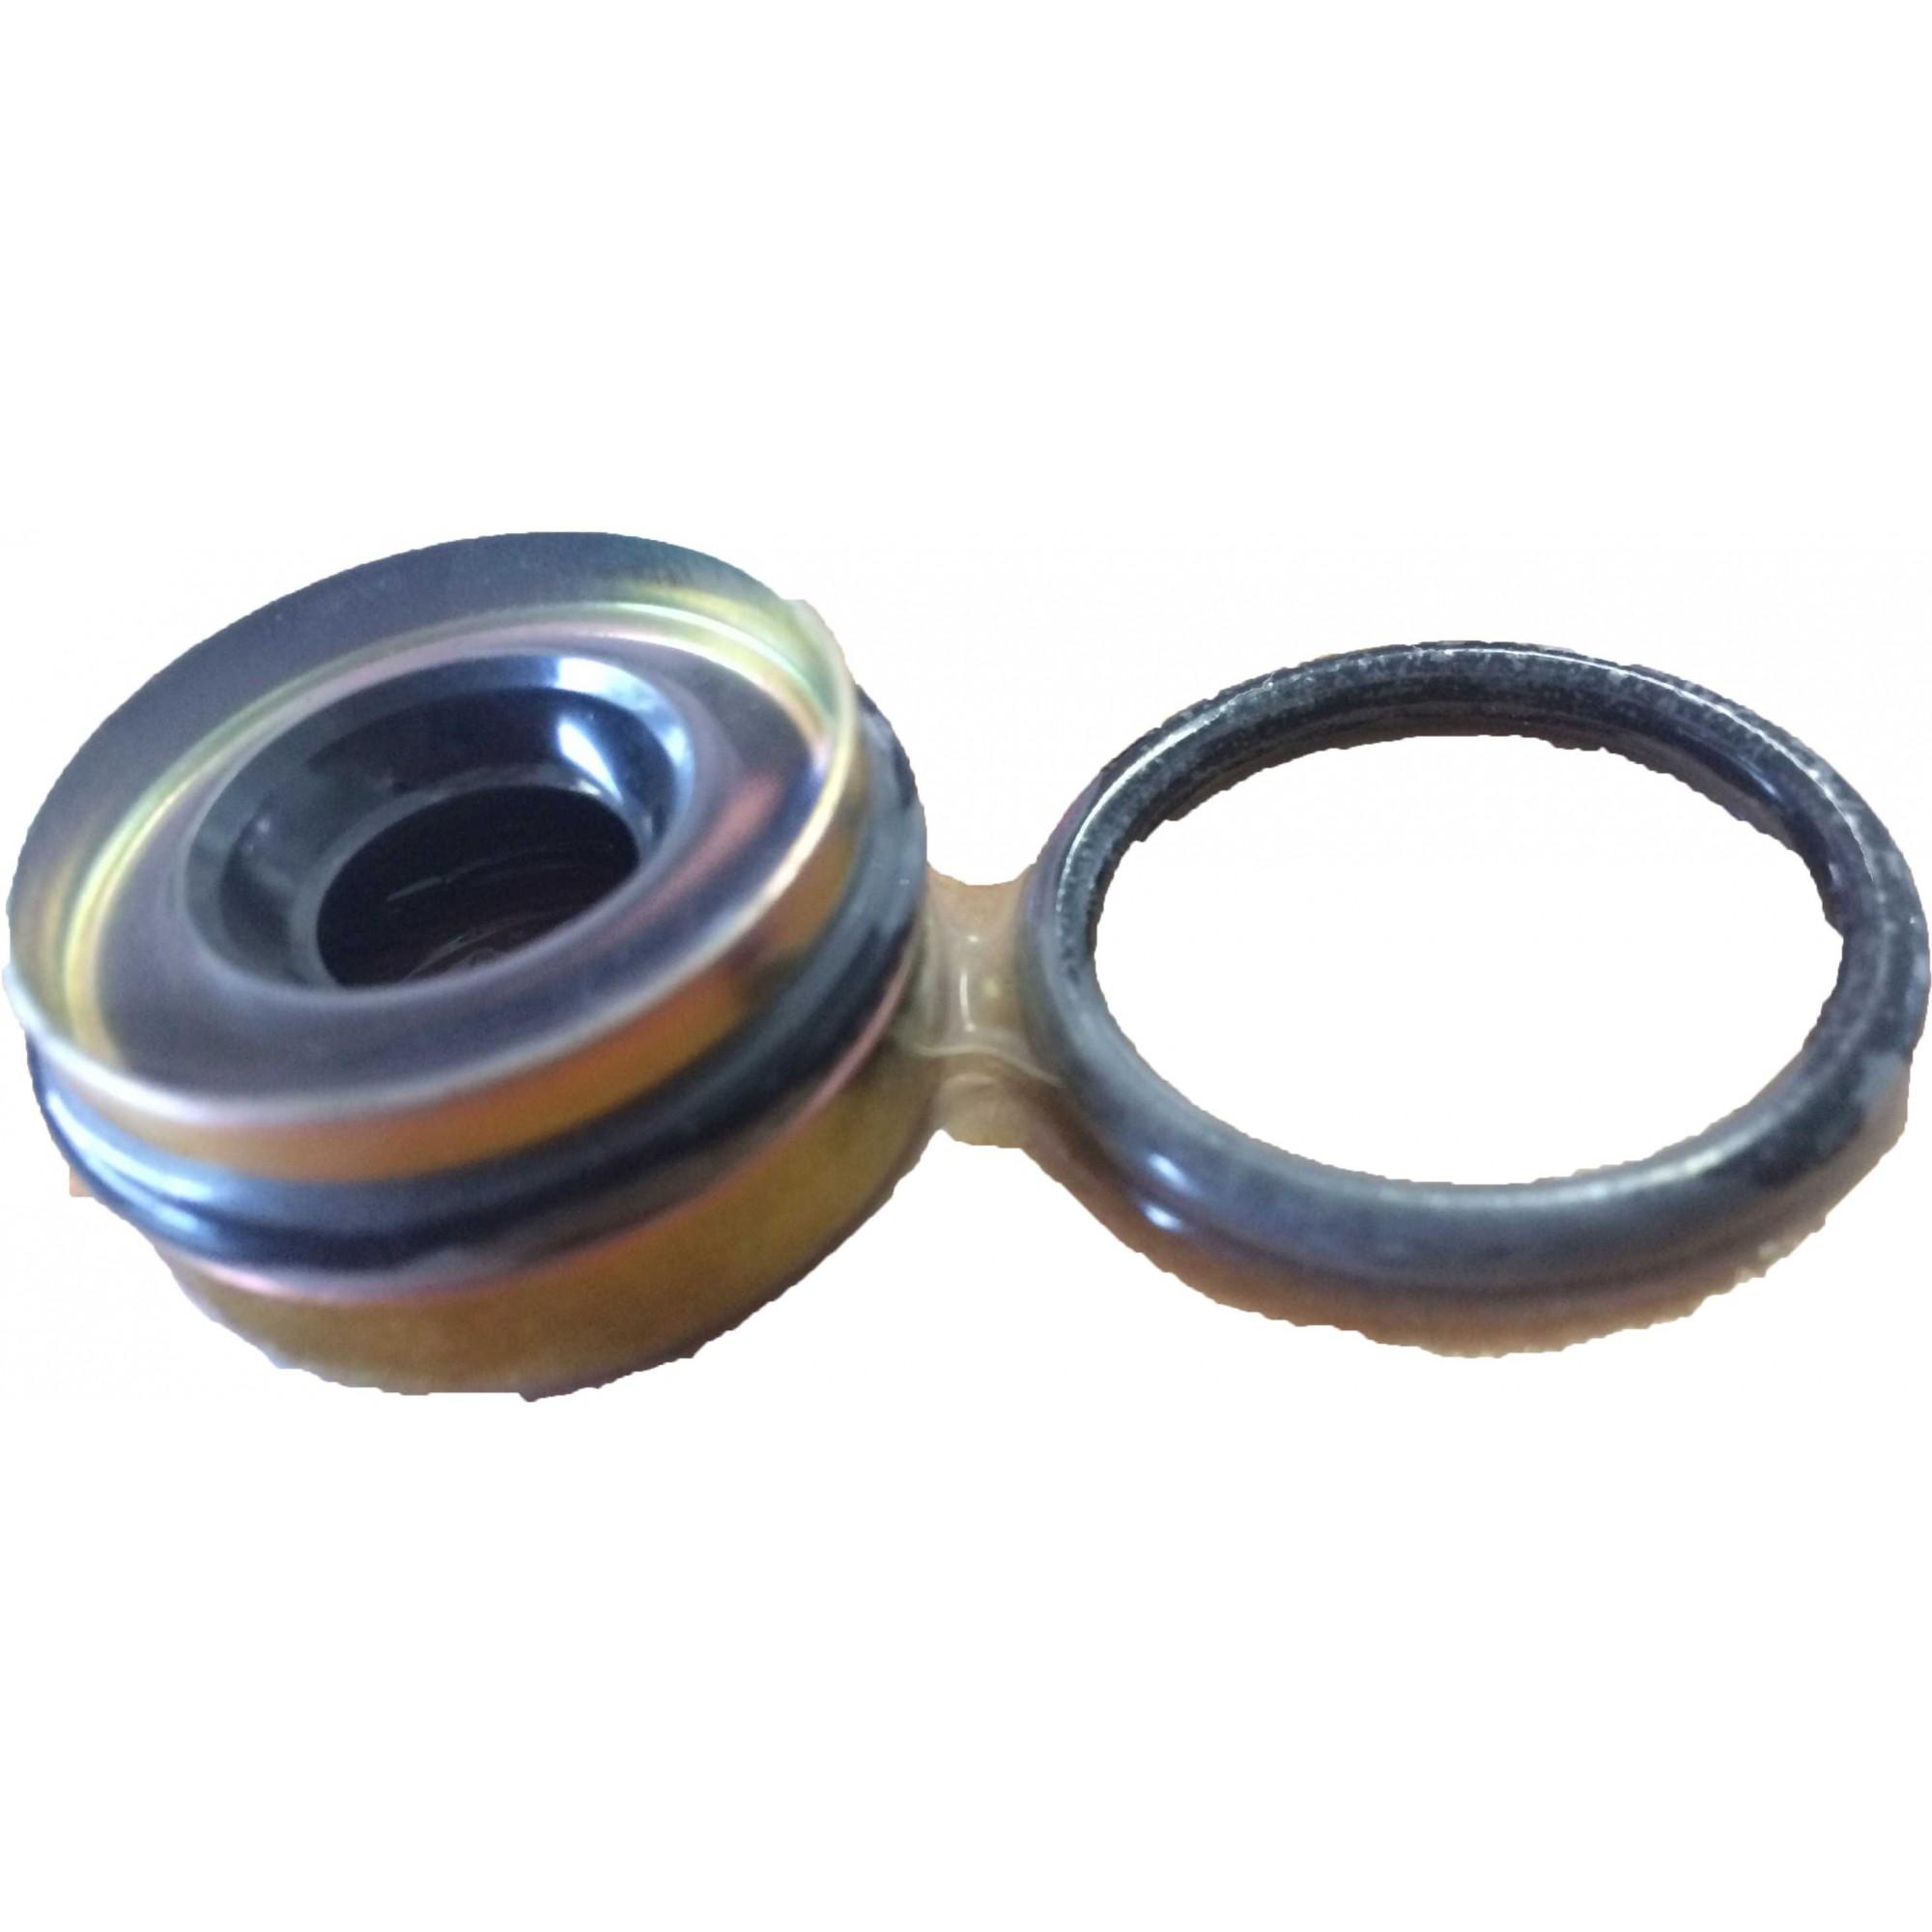 Selo Compressor - Nihon Dkv14c Zexel Corsa Lip Seal